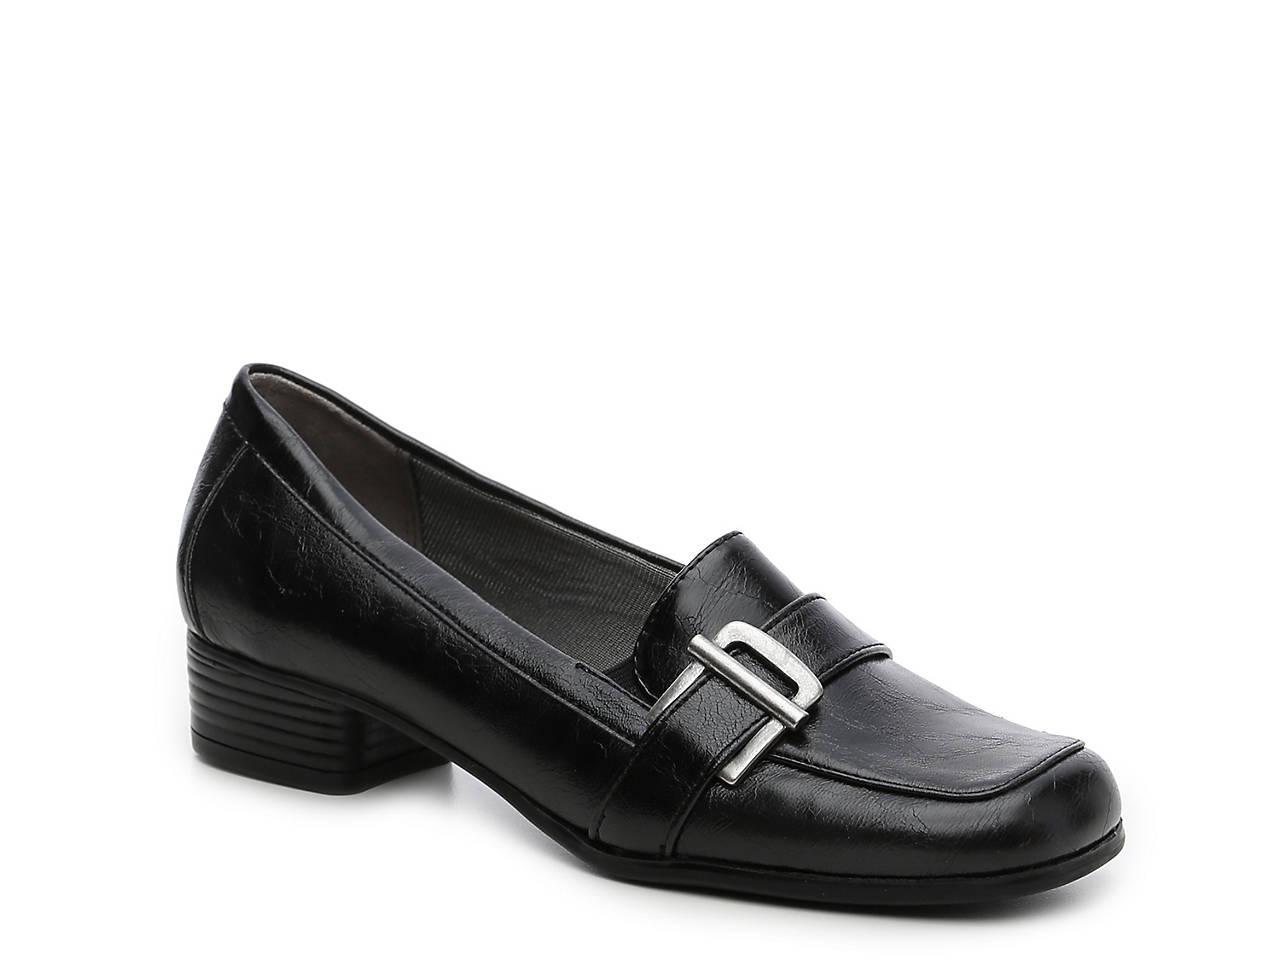 Lifestride Shoes Flats Boots Pumps Loafers Dsw